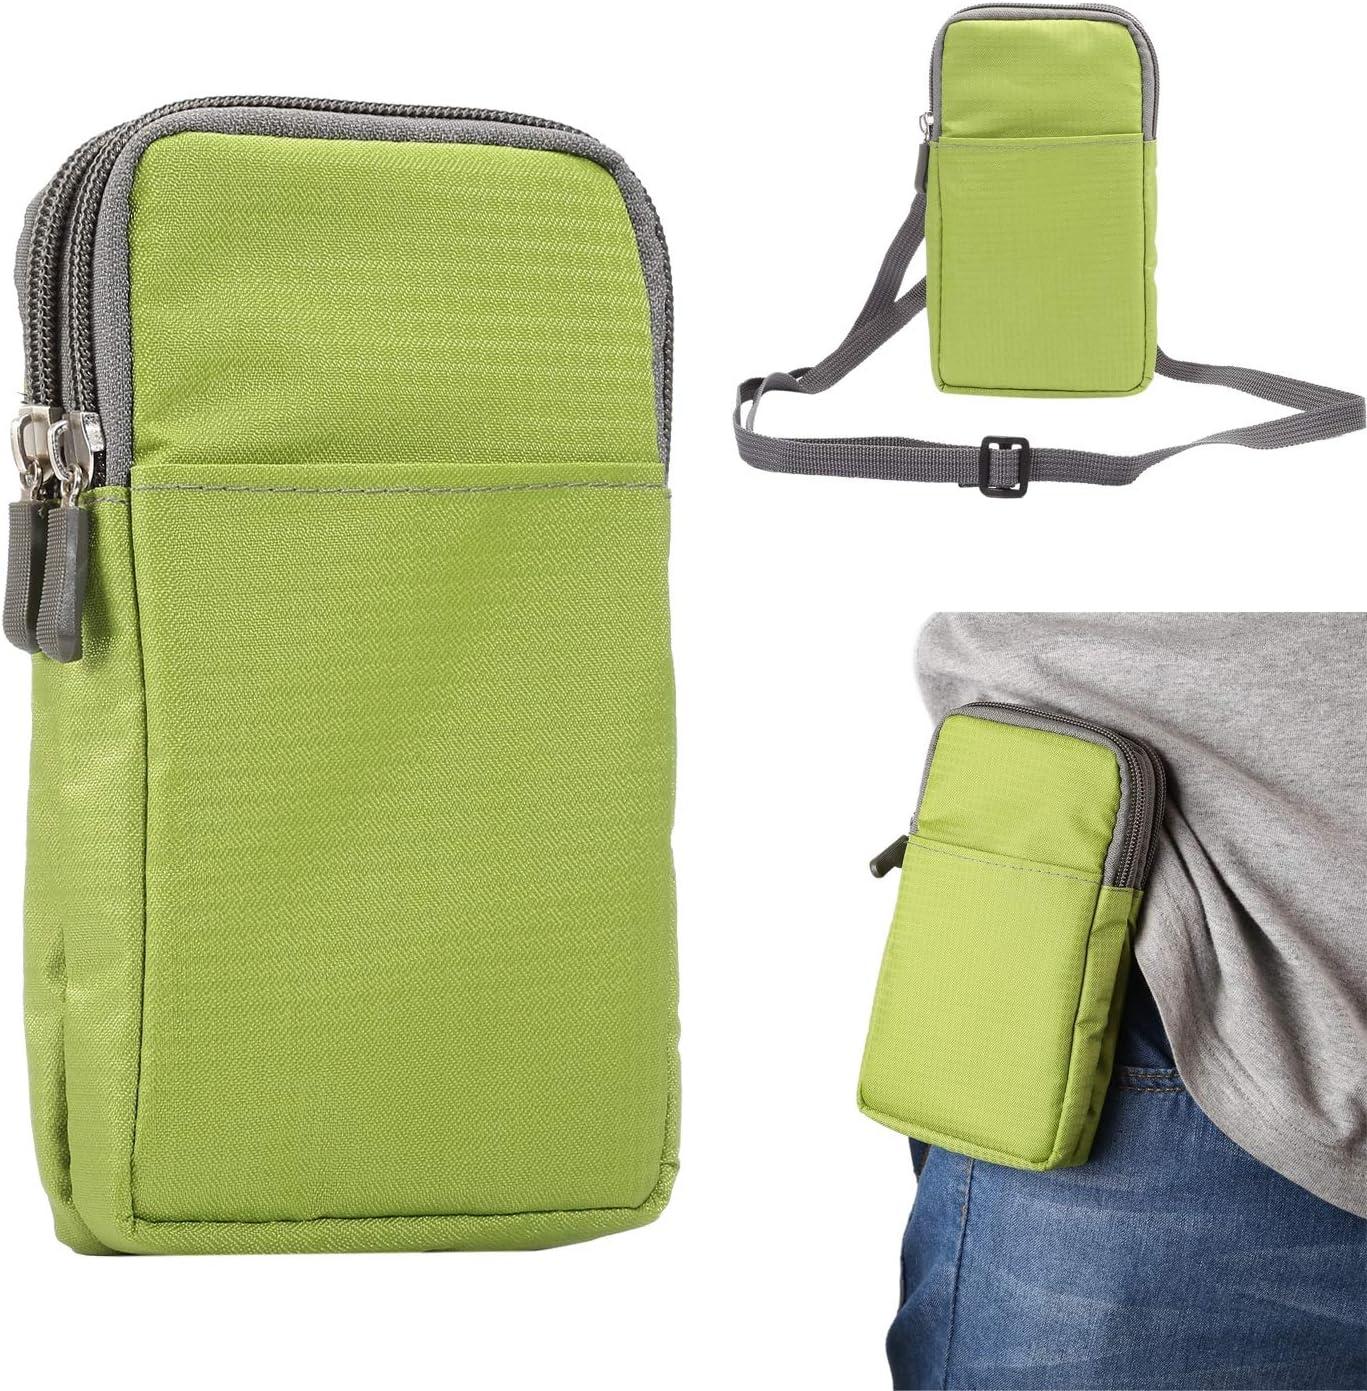 Sports Running Belt Waist Pack, Small Crossbody Bags for Men Women, 6.0 Inch Phone Wallet Case Pouch Shoulder Bag Belt Clip Holster Waist Bag Travelling Money Cell Phone Holder ( Color : Green )